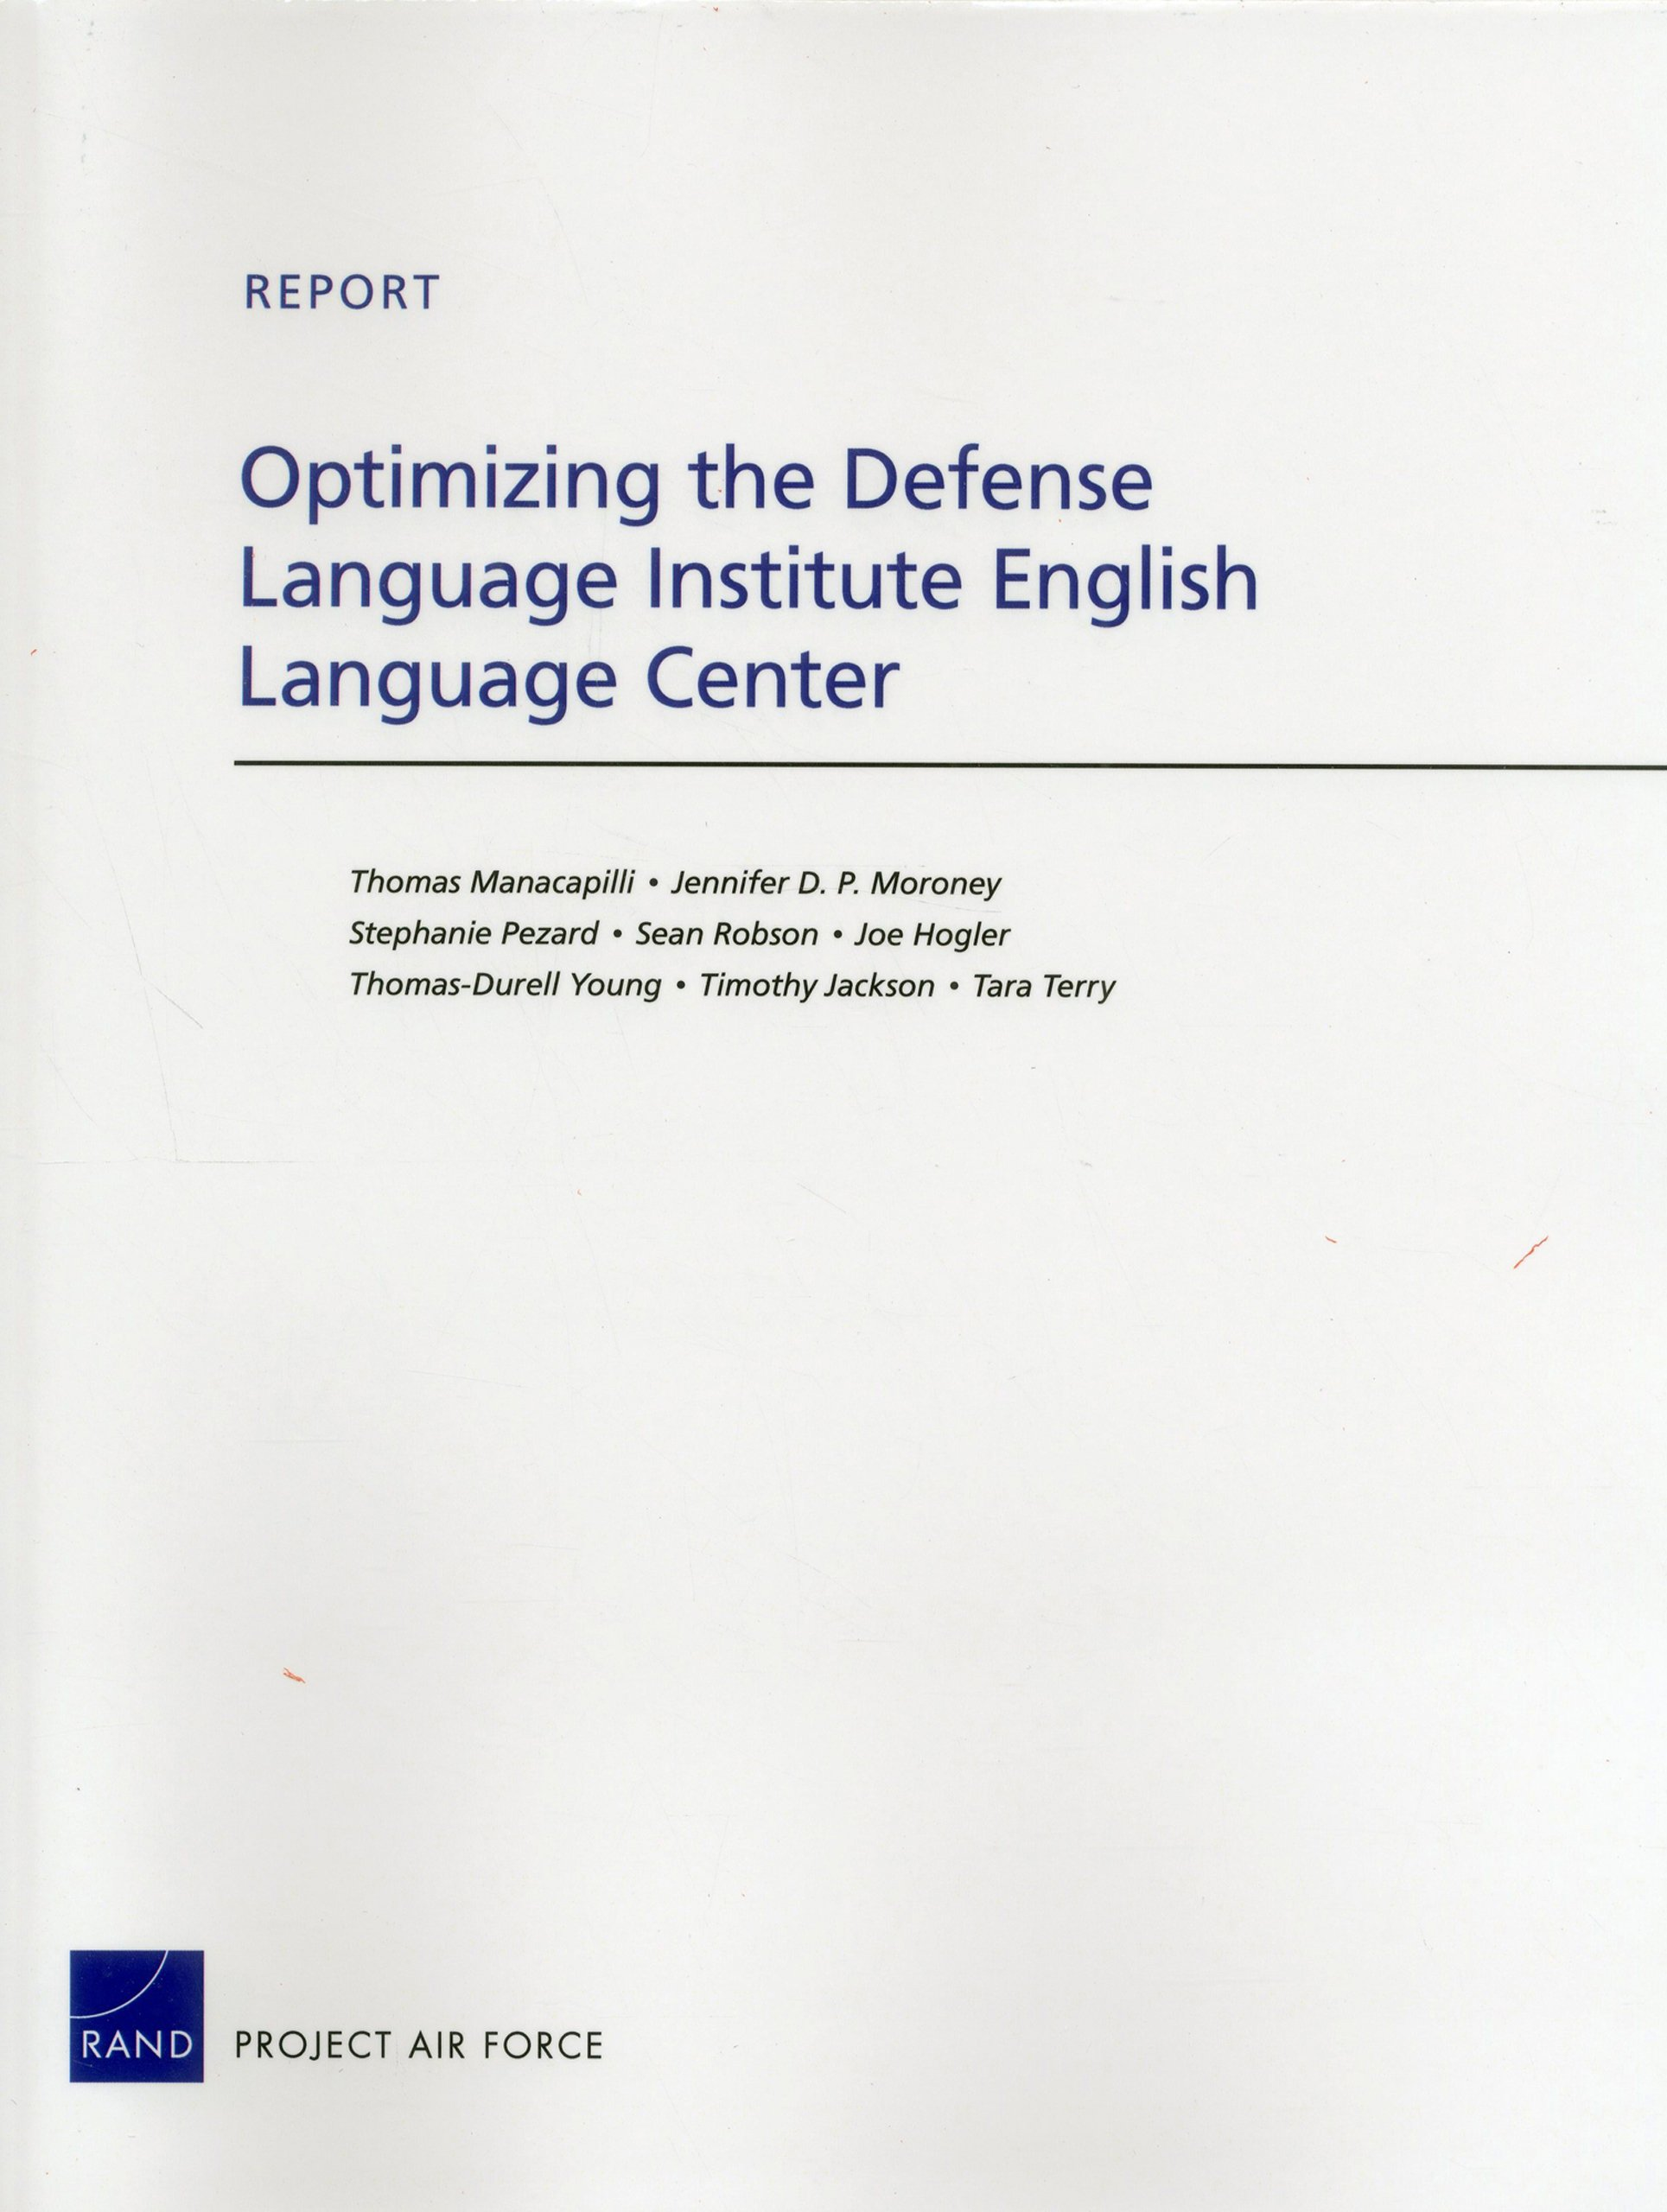 Optimizing the Defense Language Institute English Language Center